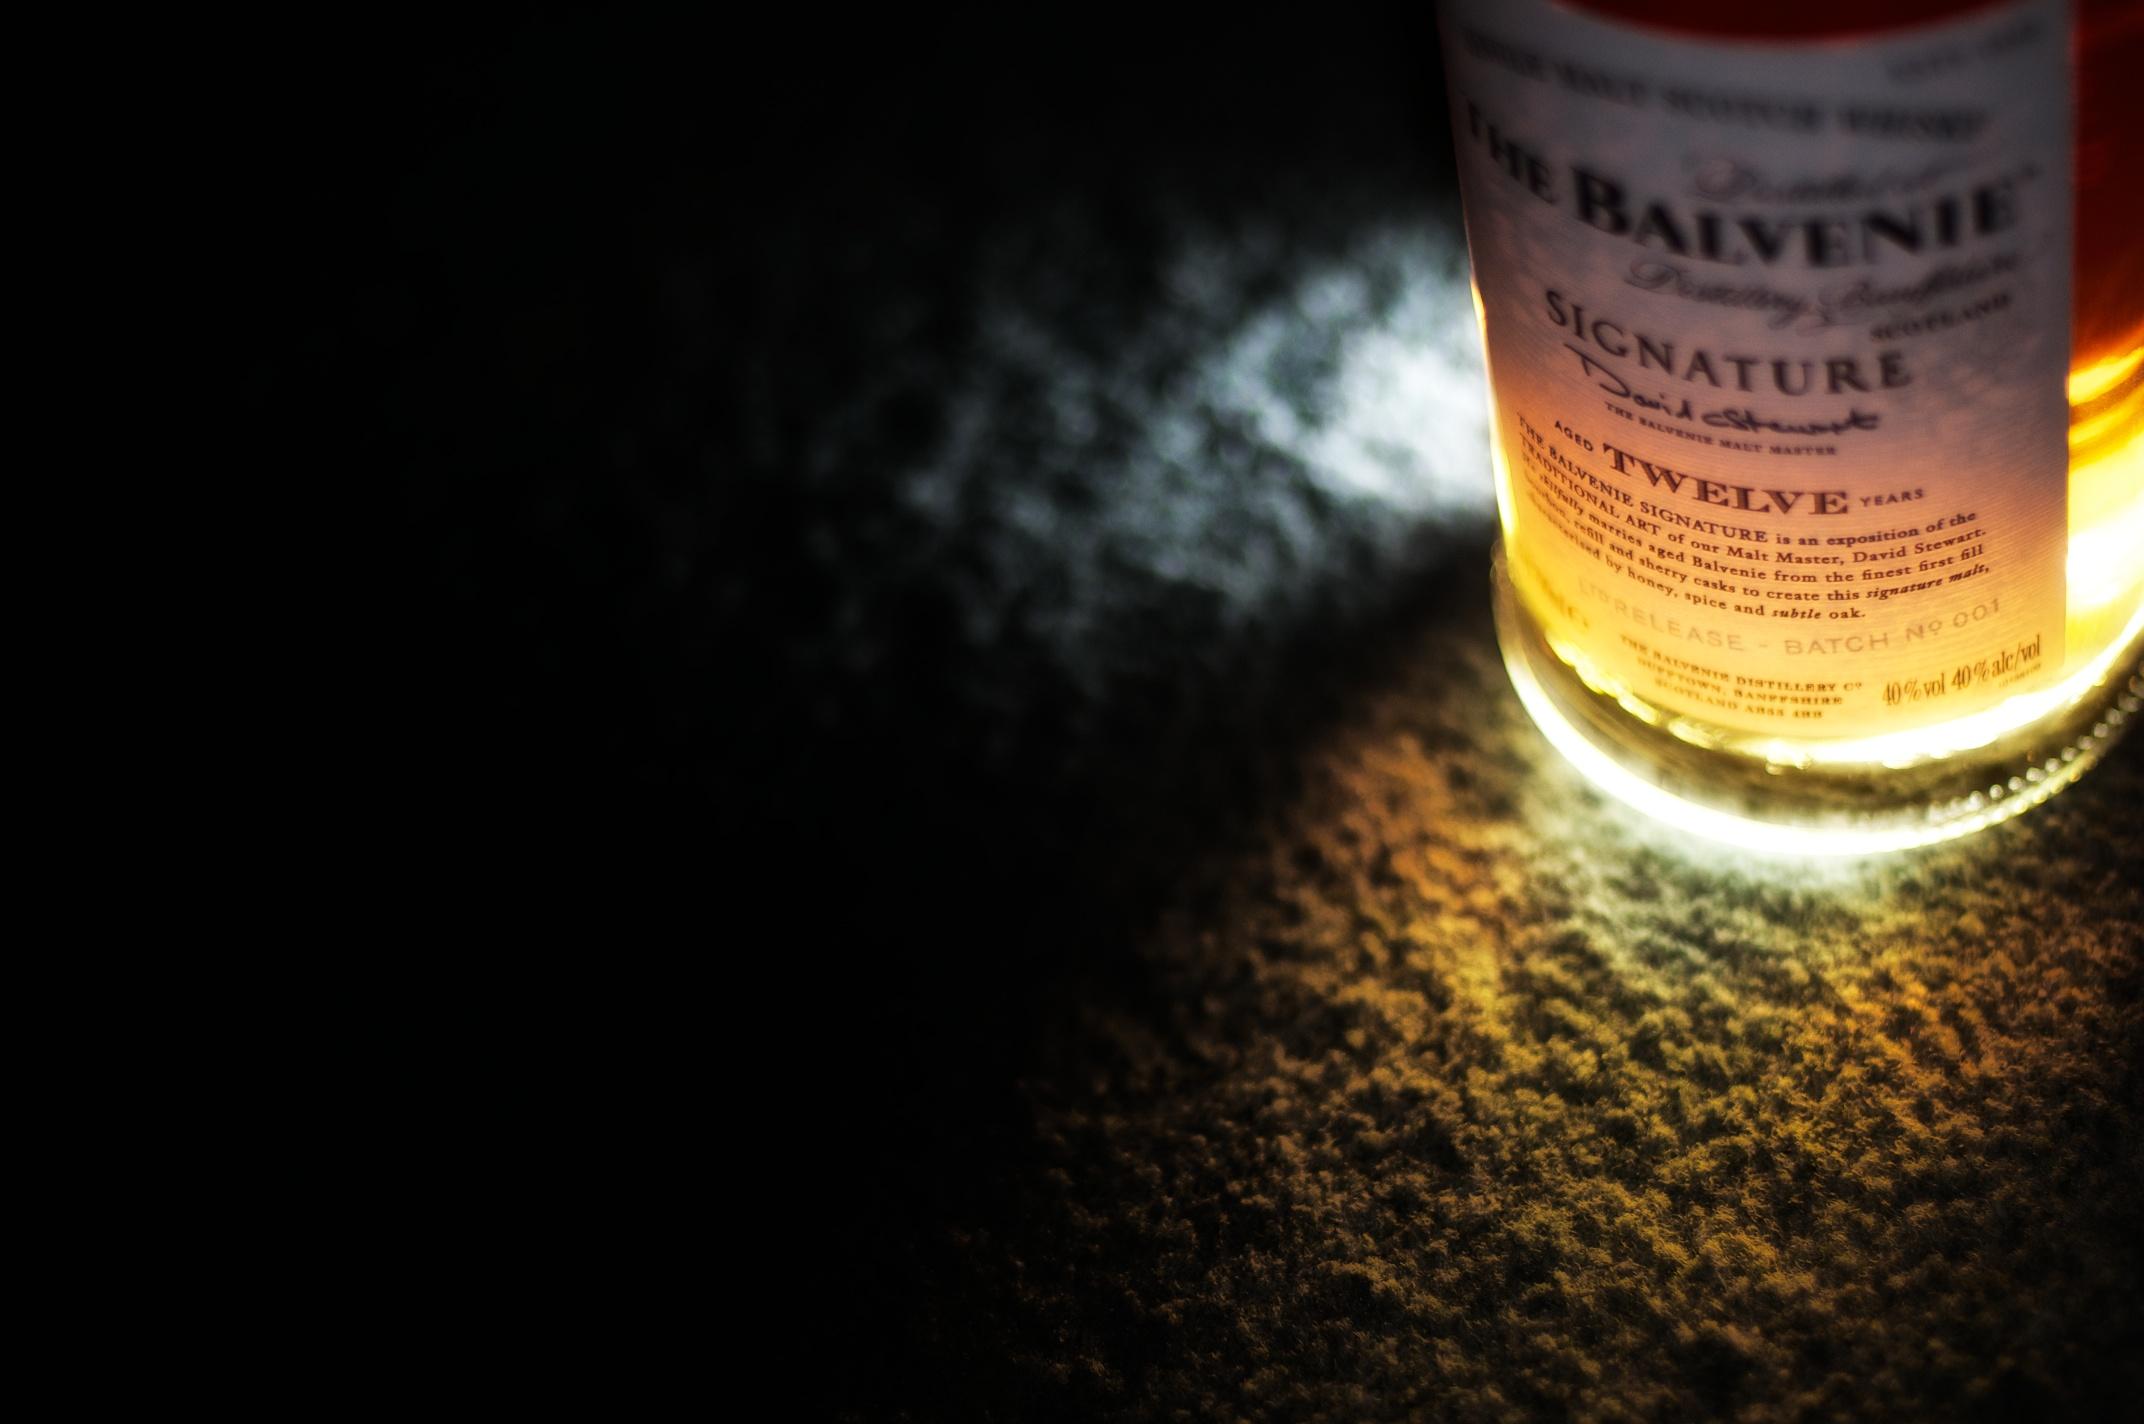 wallpaper whiskey bourbon alcohol - photo #47